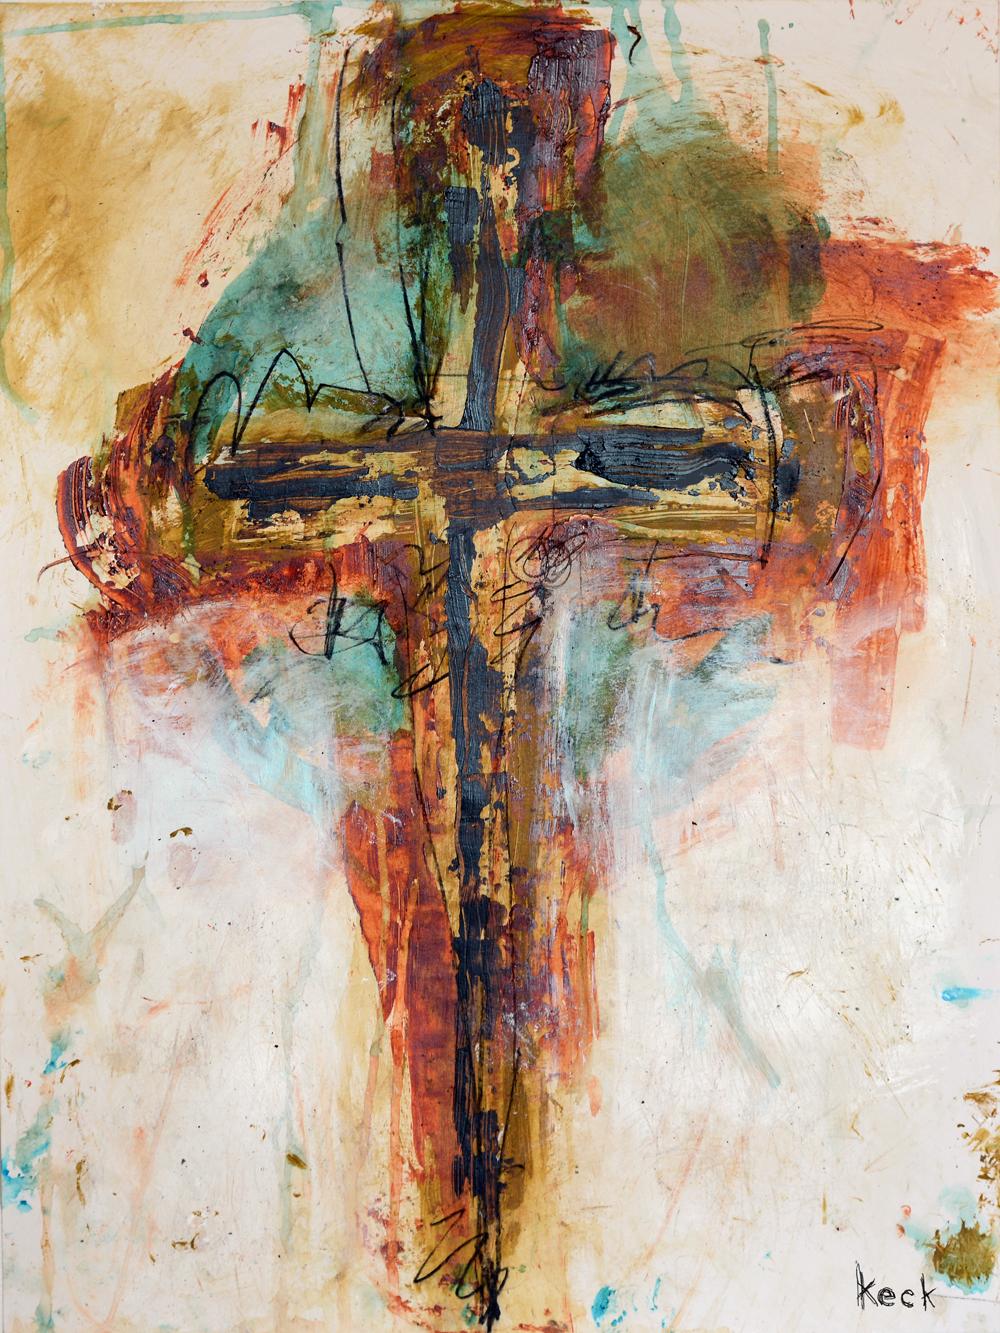 cross art print, religious cross art, abstract cross art painting, cross art giclee print, painting of a cross, art print with cross, cross art, crucifix art